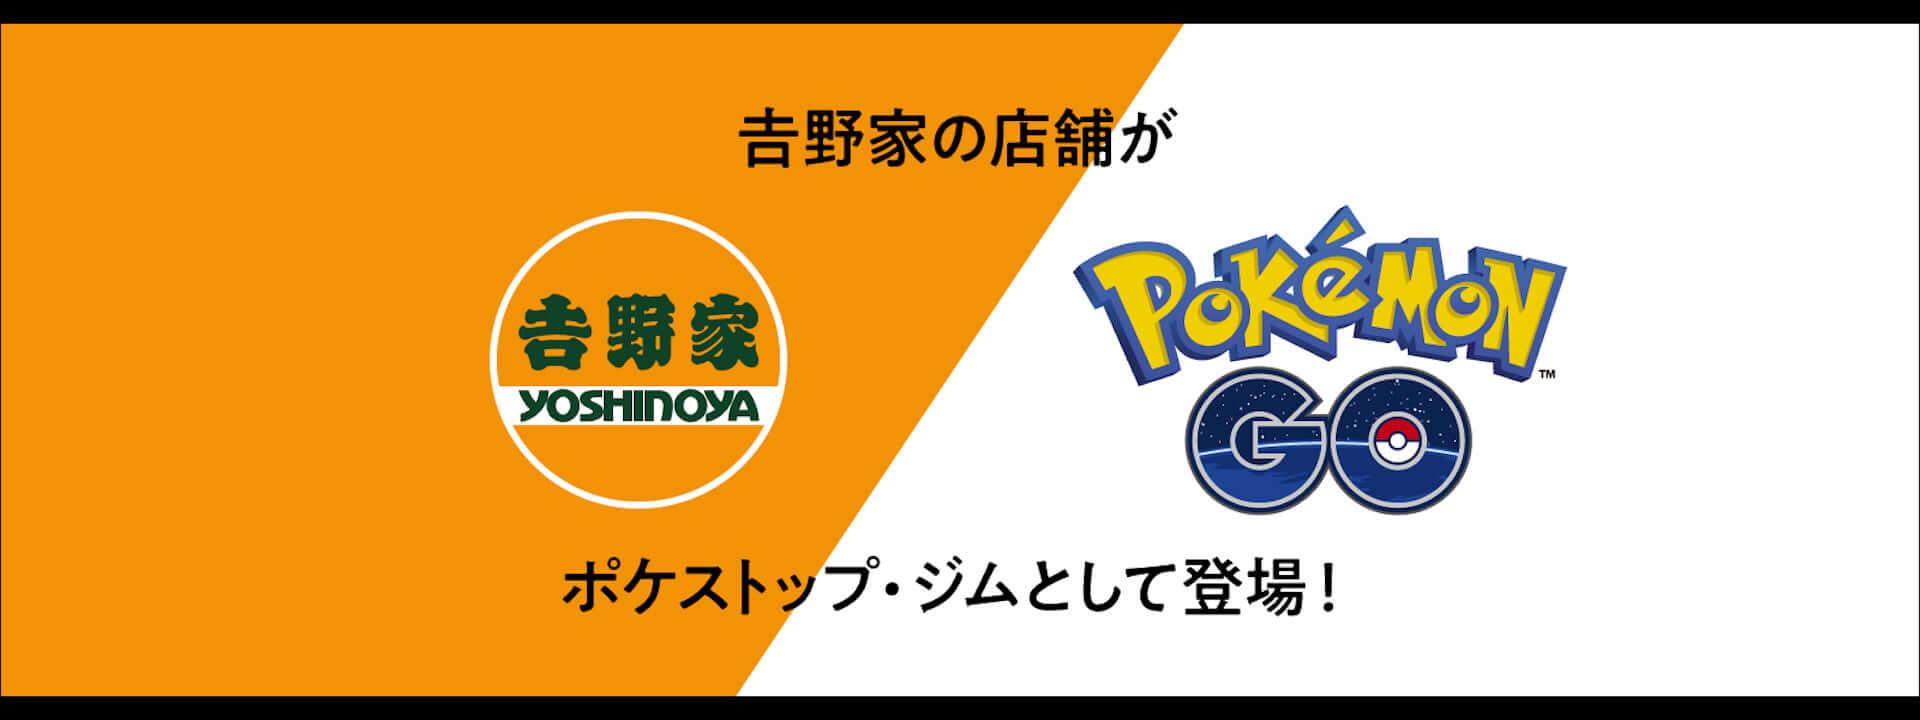 『Pokémon GO』に吉野家がポケストップ&ジムとして登場!ゲーム内では10%引きクーポンも配布 tech201020_yoshinoya-pokemongo_3-1920x720